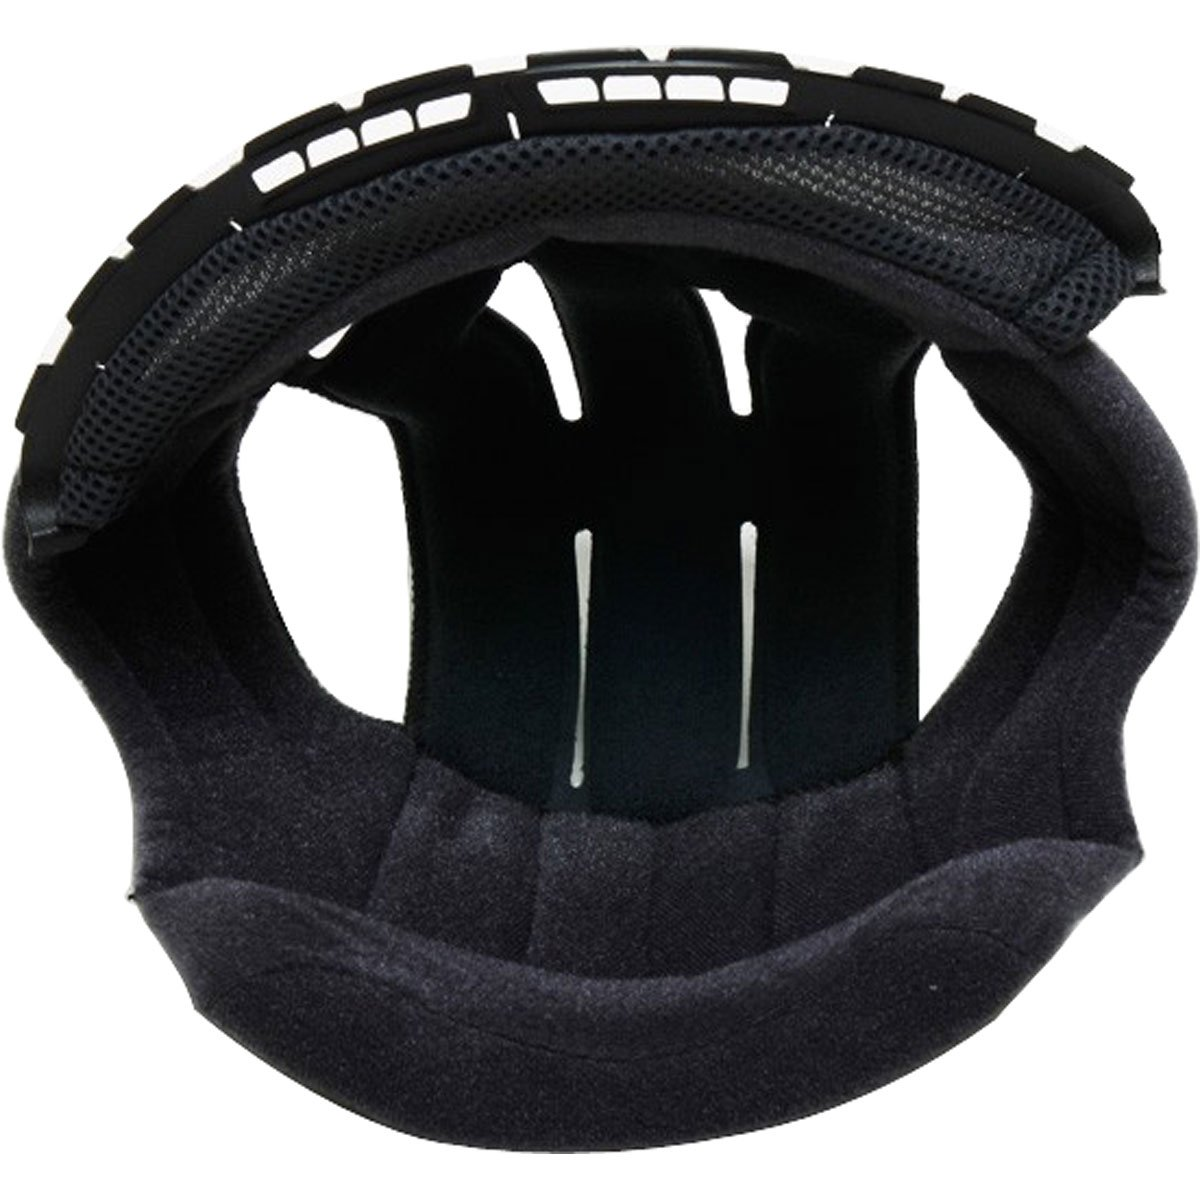 Shoei Neotec Center Pad XL13 Street Motorcycle Helmet Accessories - Black/X-Large